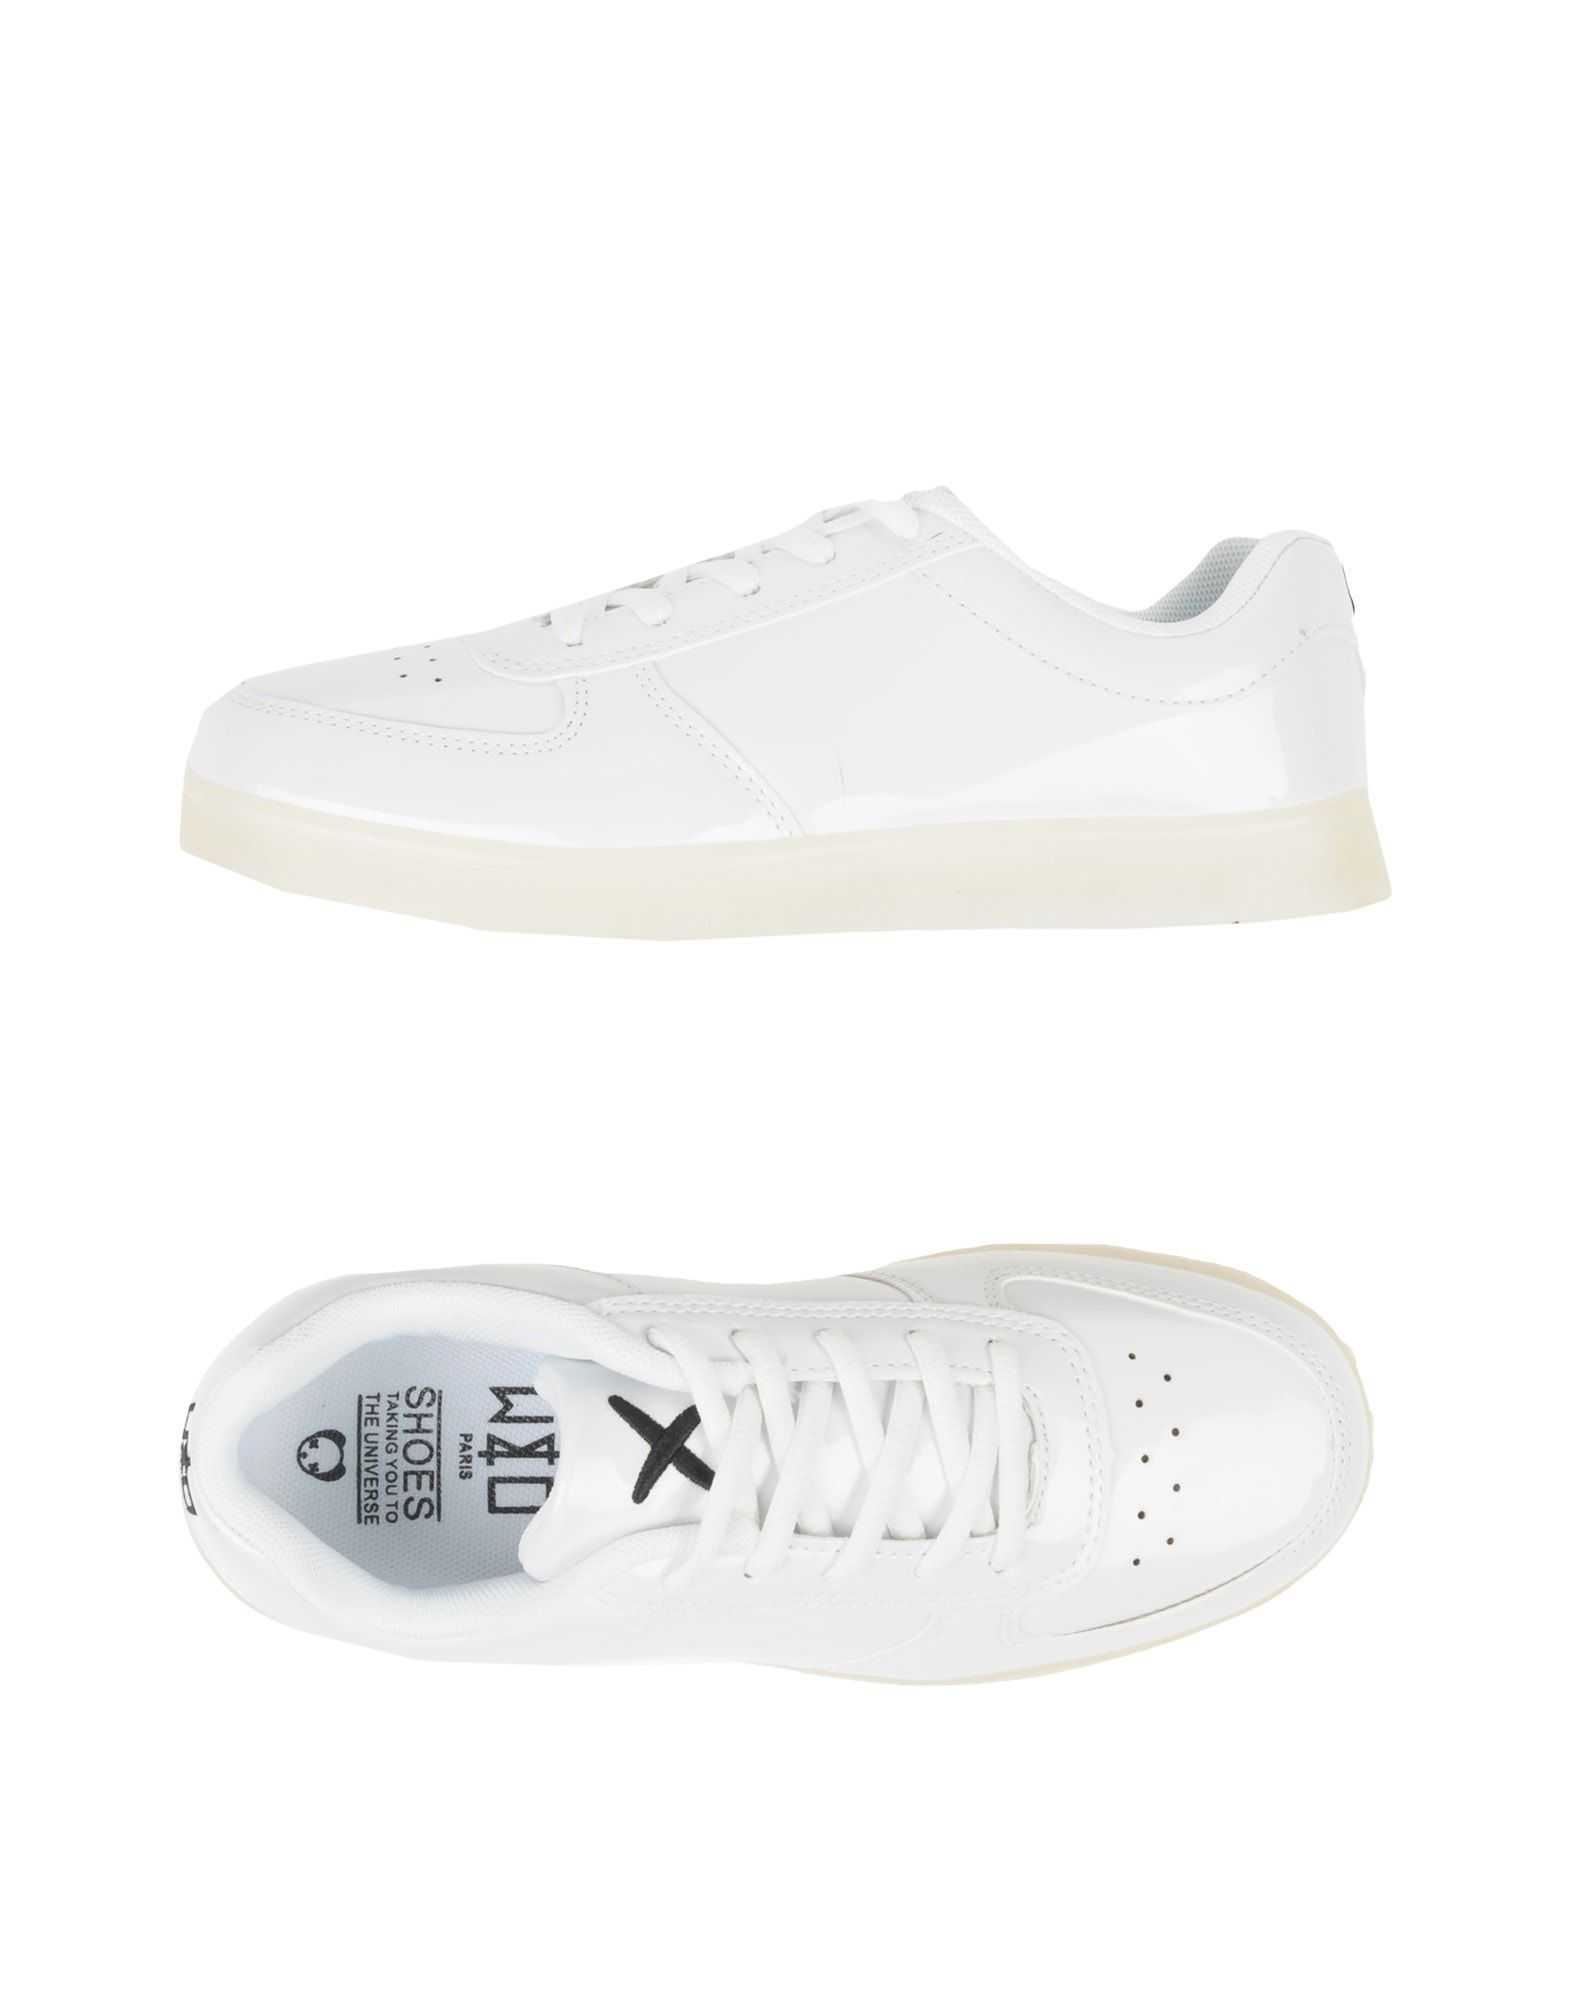 Wize & Ope Sneakers Damen  11314252UO Gute Qualität beliebte Schuhe